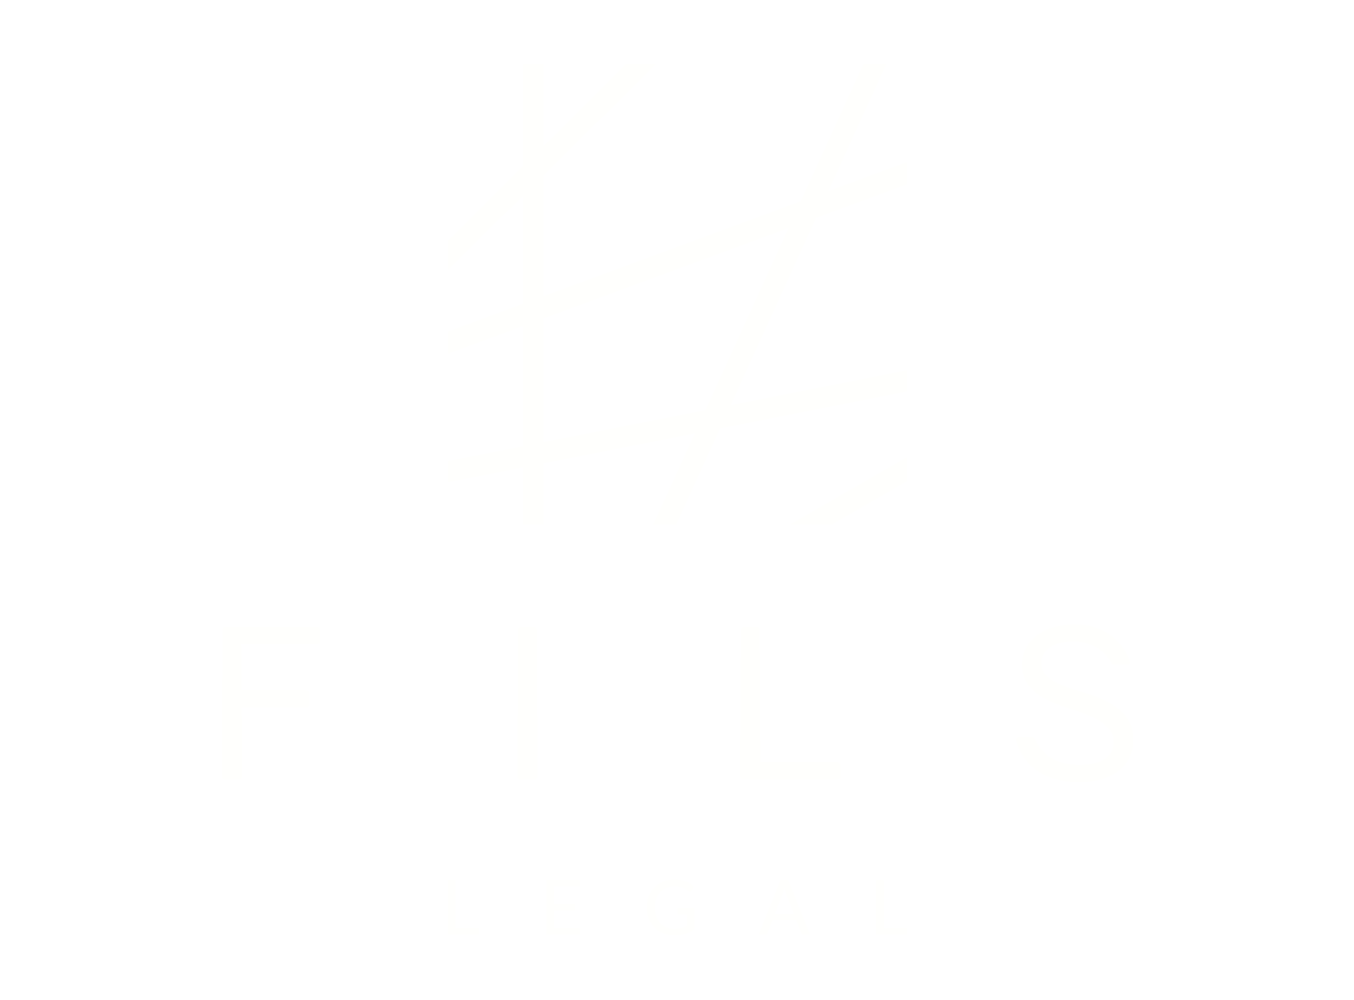 Fils Legal